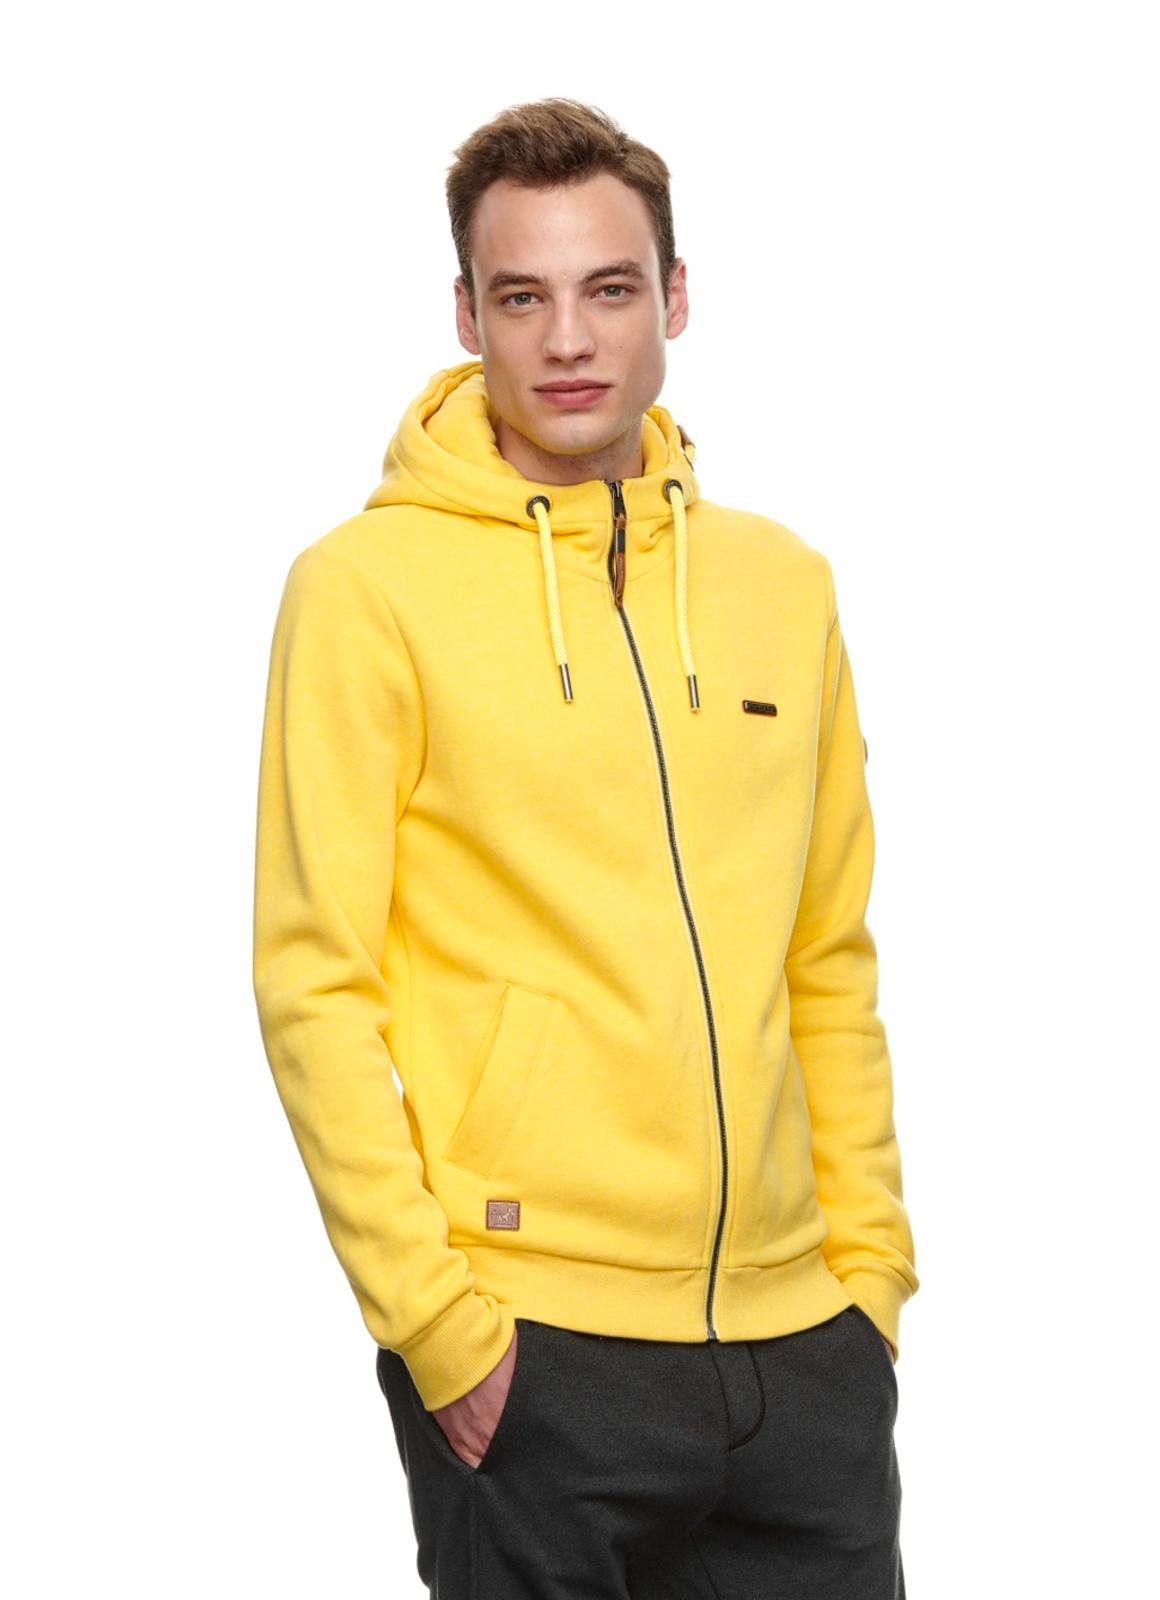 Ragwear Herren Sweat Jacke gelb unifarben Nate Zip 2112 30016 6028 Yellow